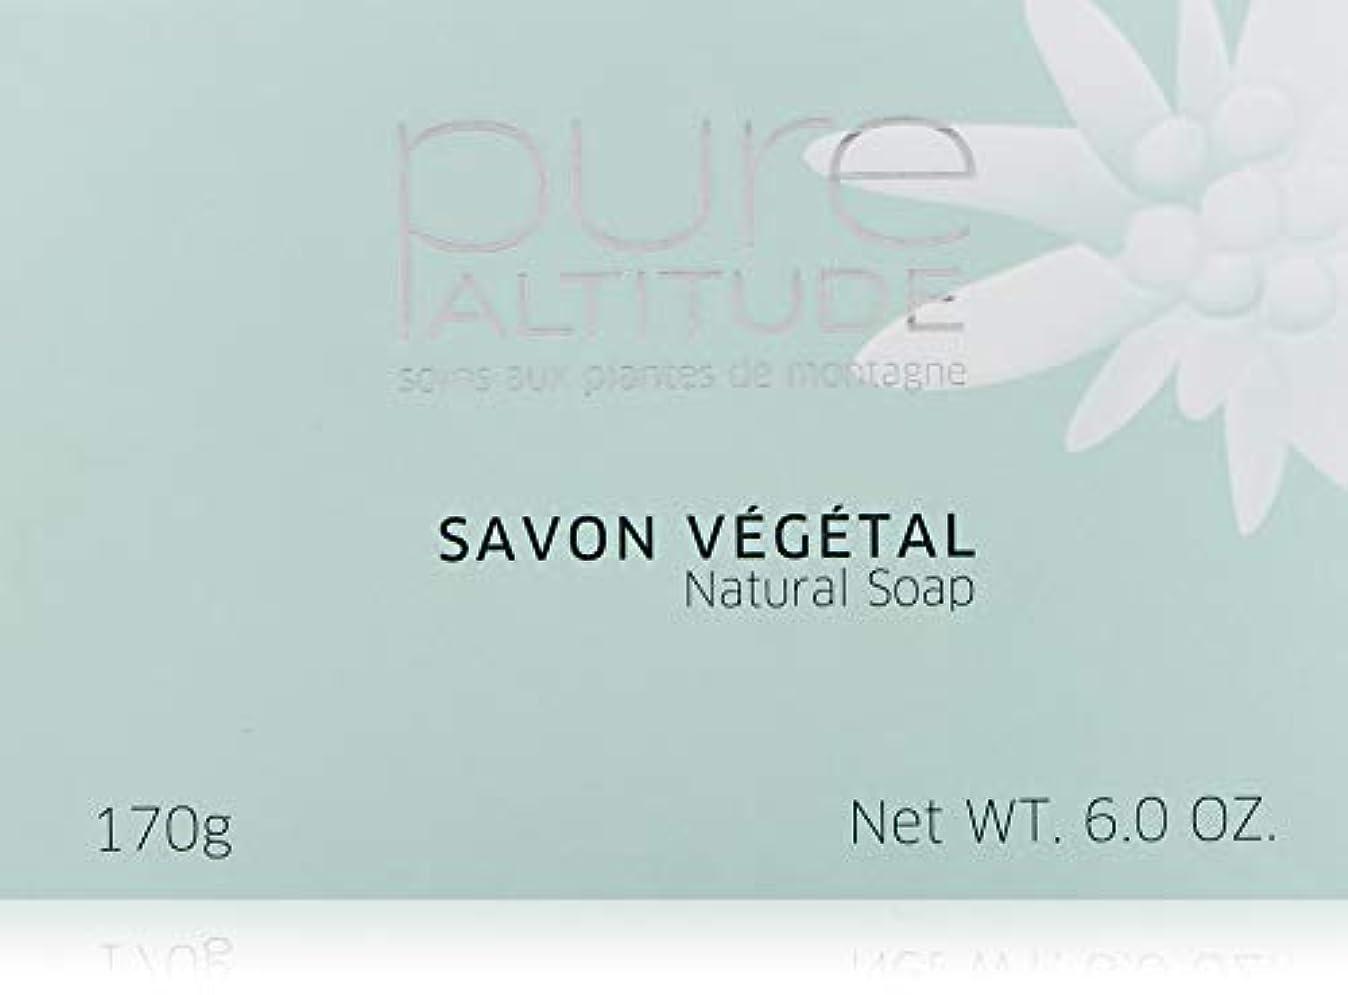 夜間雑品明示的にPure(ピュール) SAVON VÉGÉTAL SENTEUR FLEURS DE NEIGE 170g 石鹸